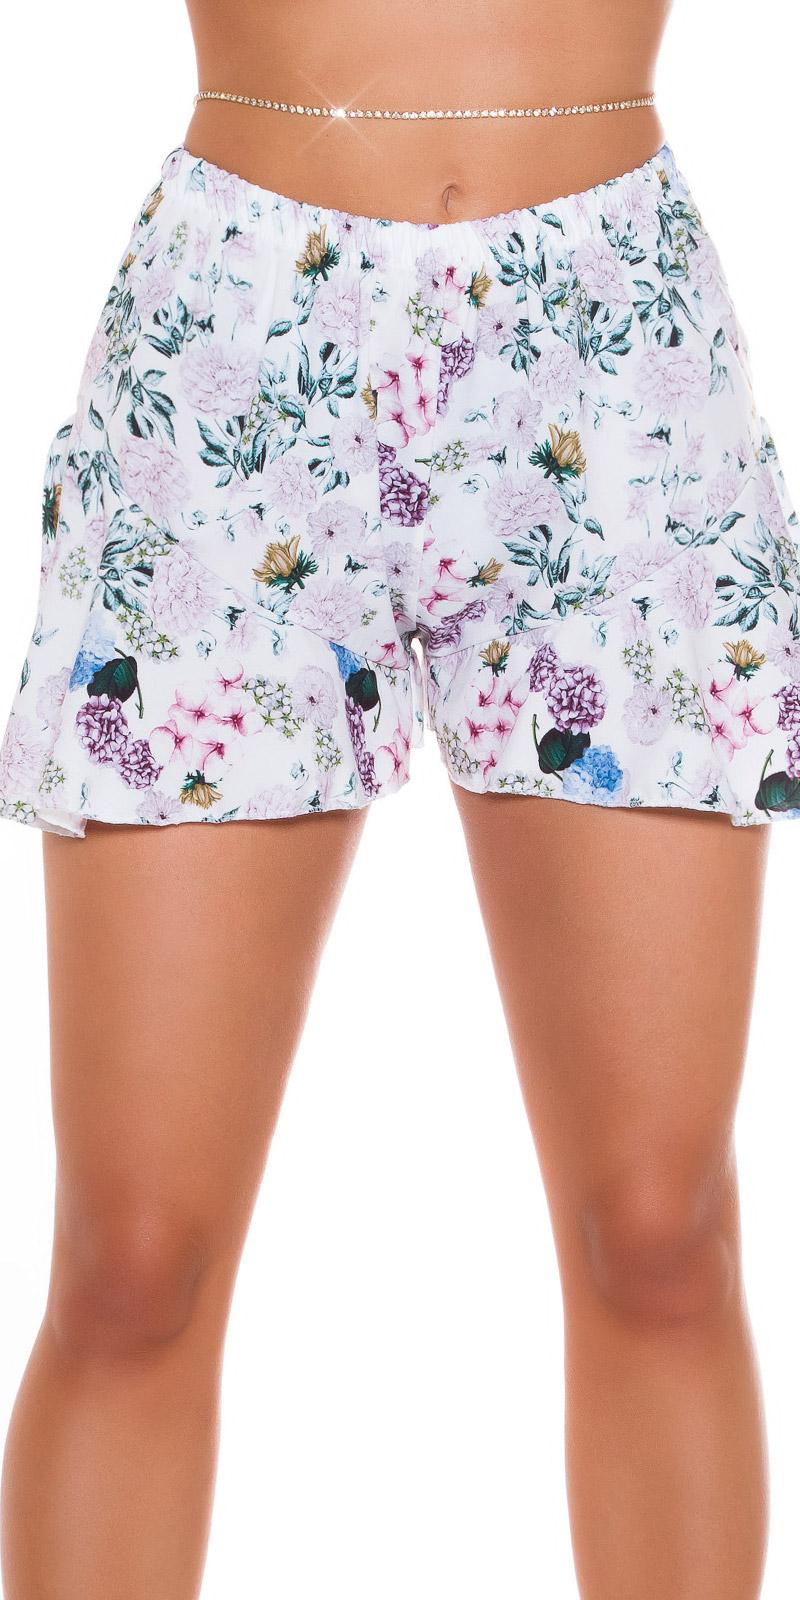 Pantaloni scurti Sexy cu incretituriFloral